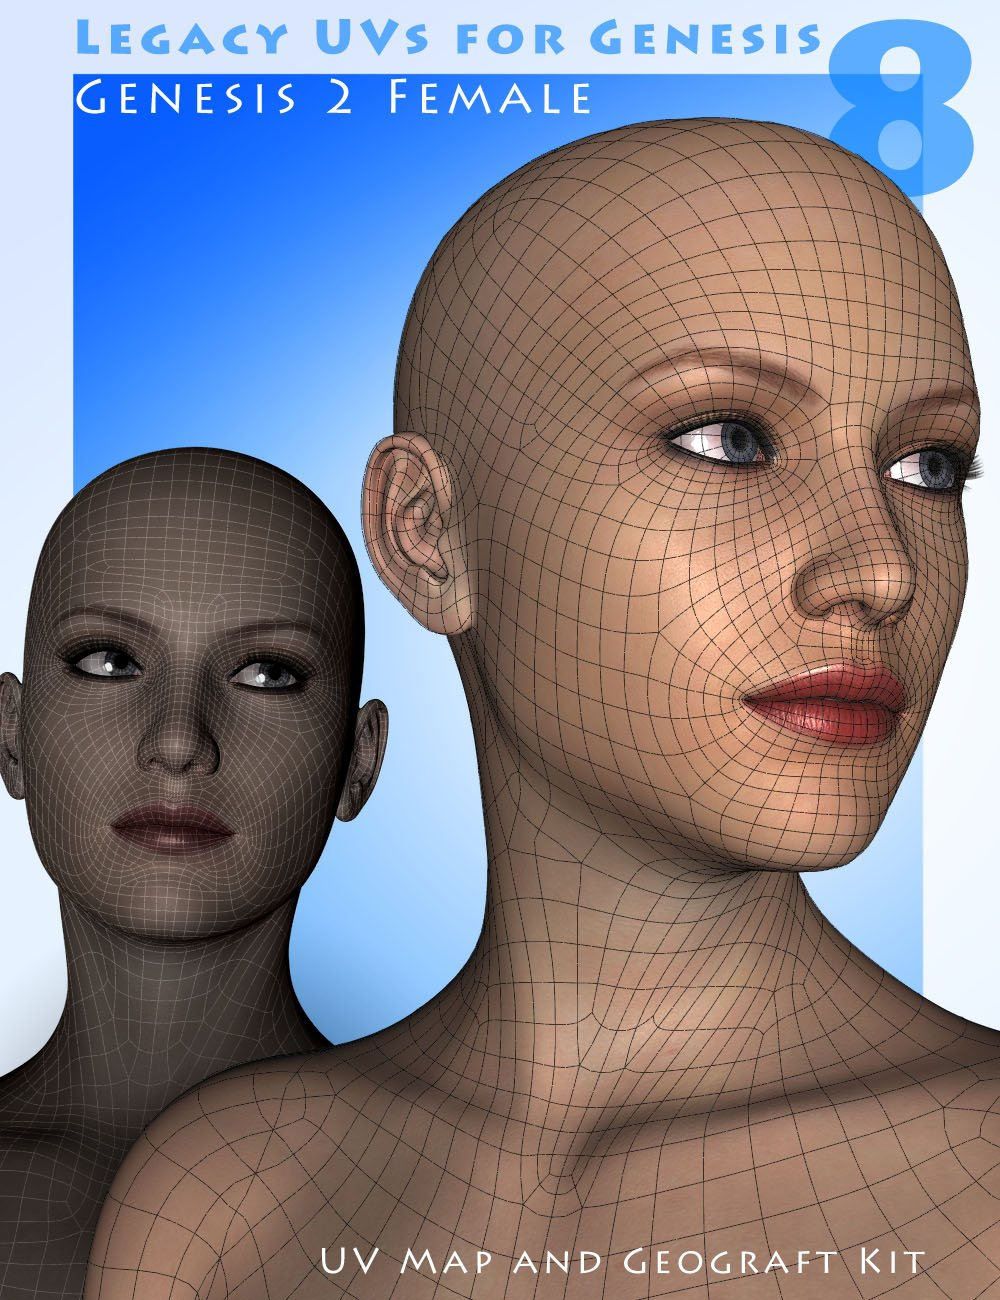 Legacy UVs for Genesis 8: Genesis 2 Female by: Cayman Studios, 3D Models by Daz 3D